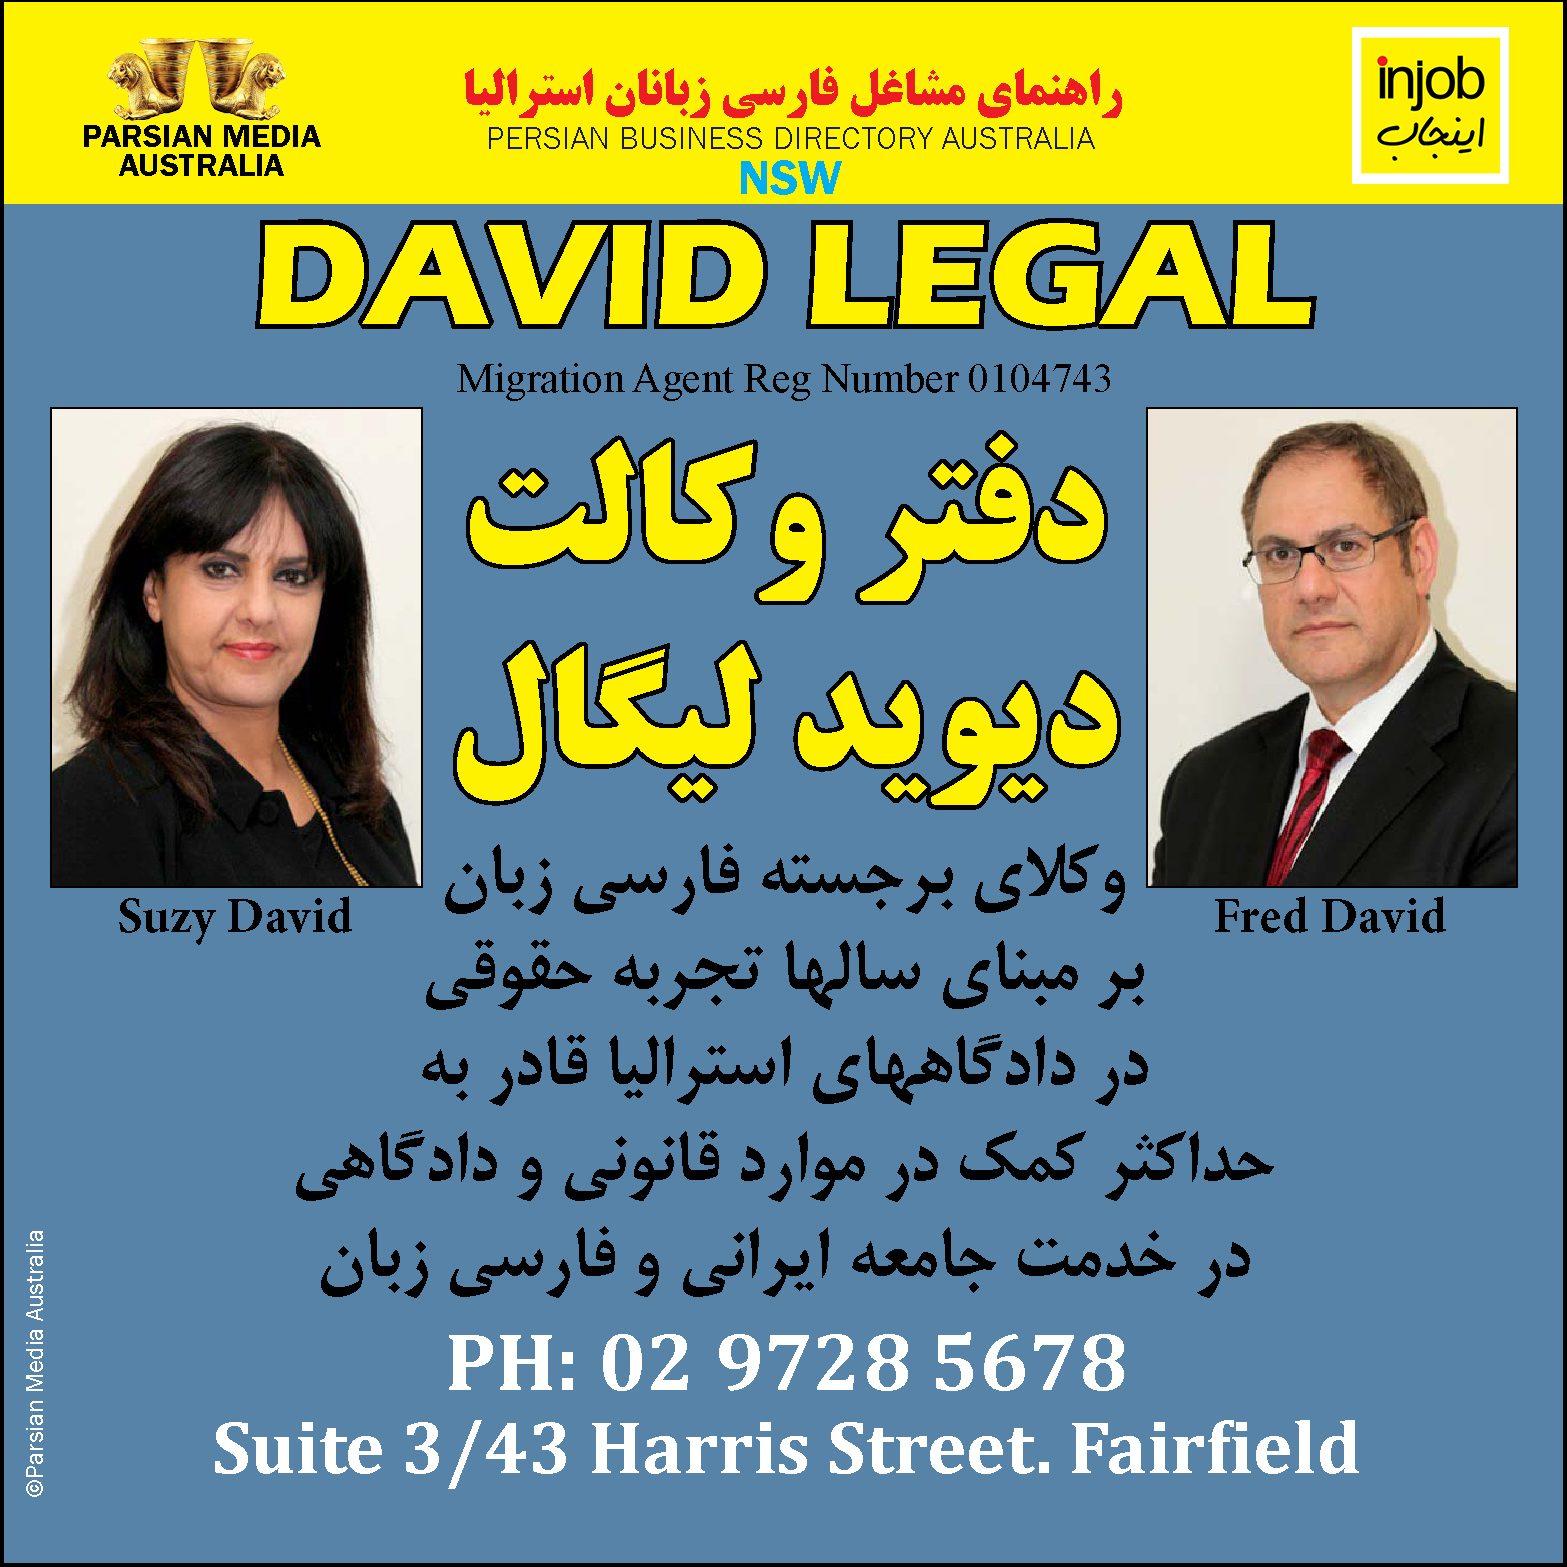 David Legal-Injob 2021-online.jpg